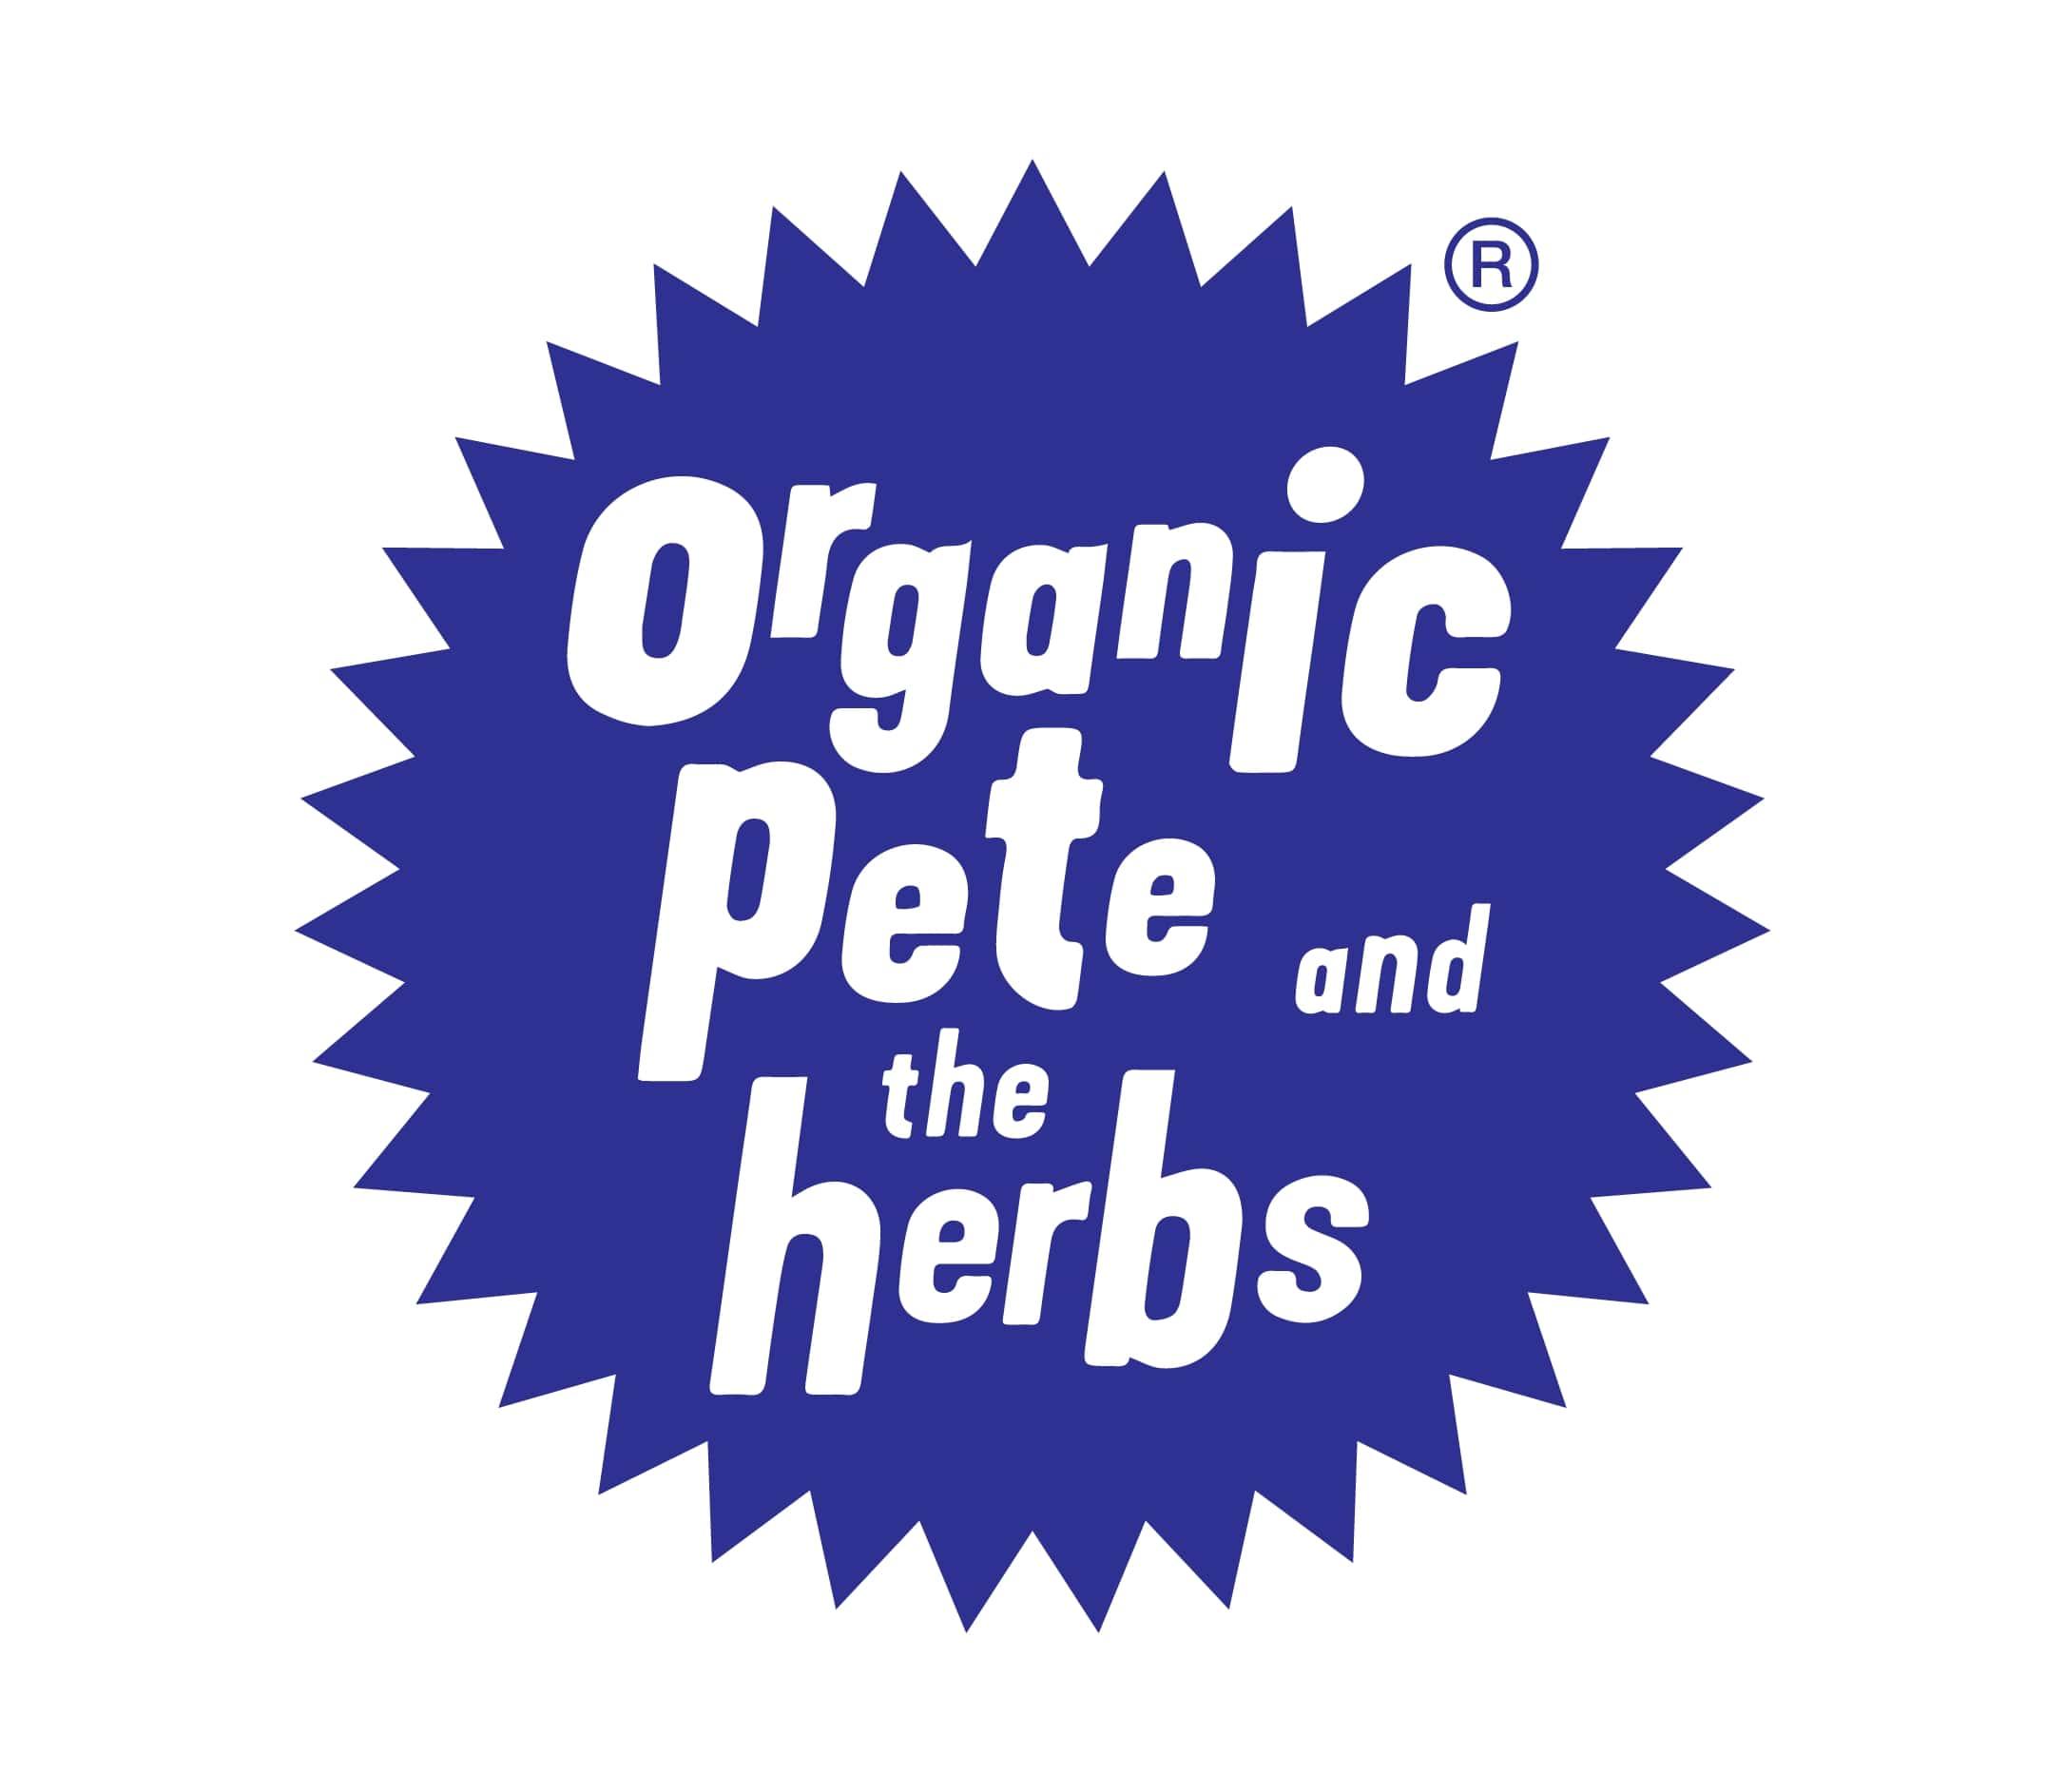 Organic Pete ARTWORK 2.jpg